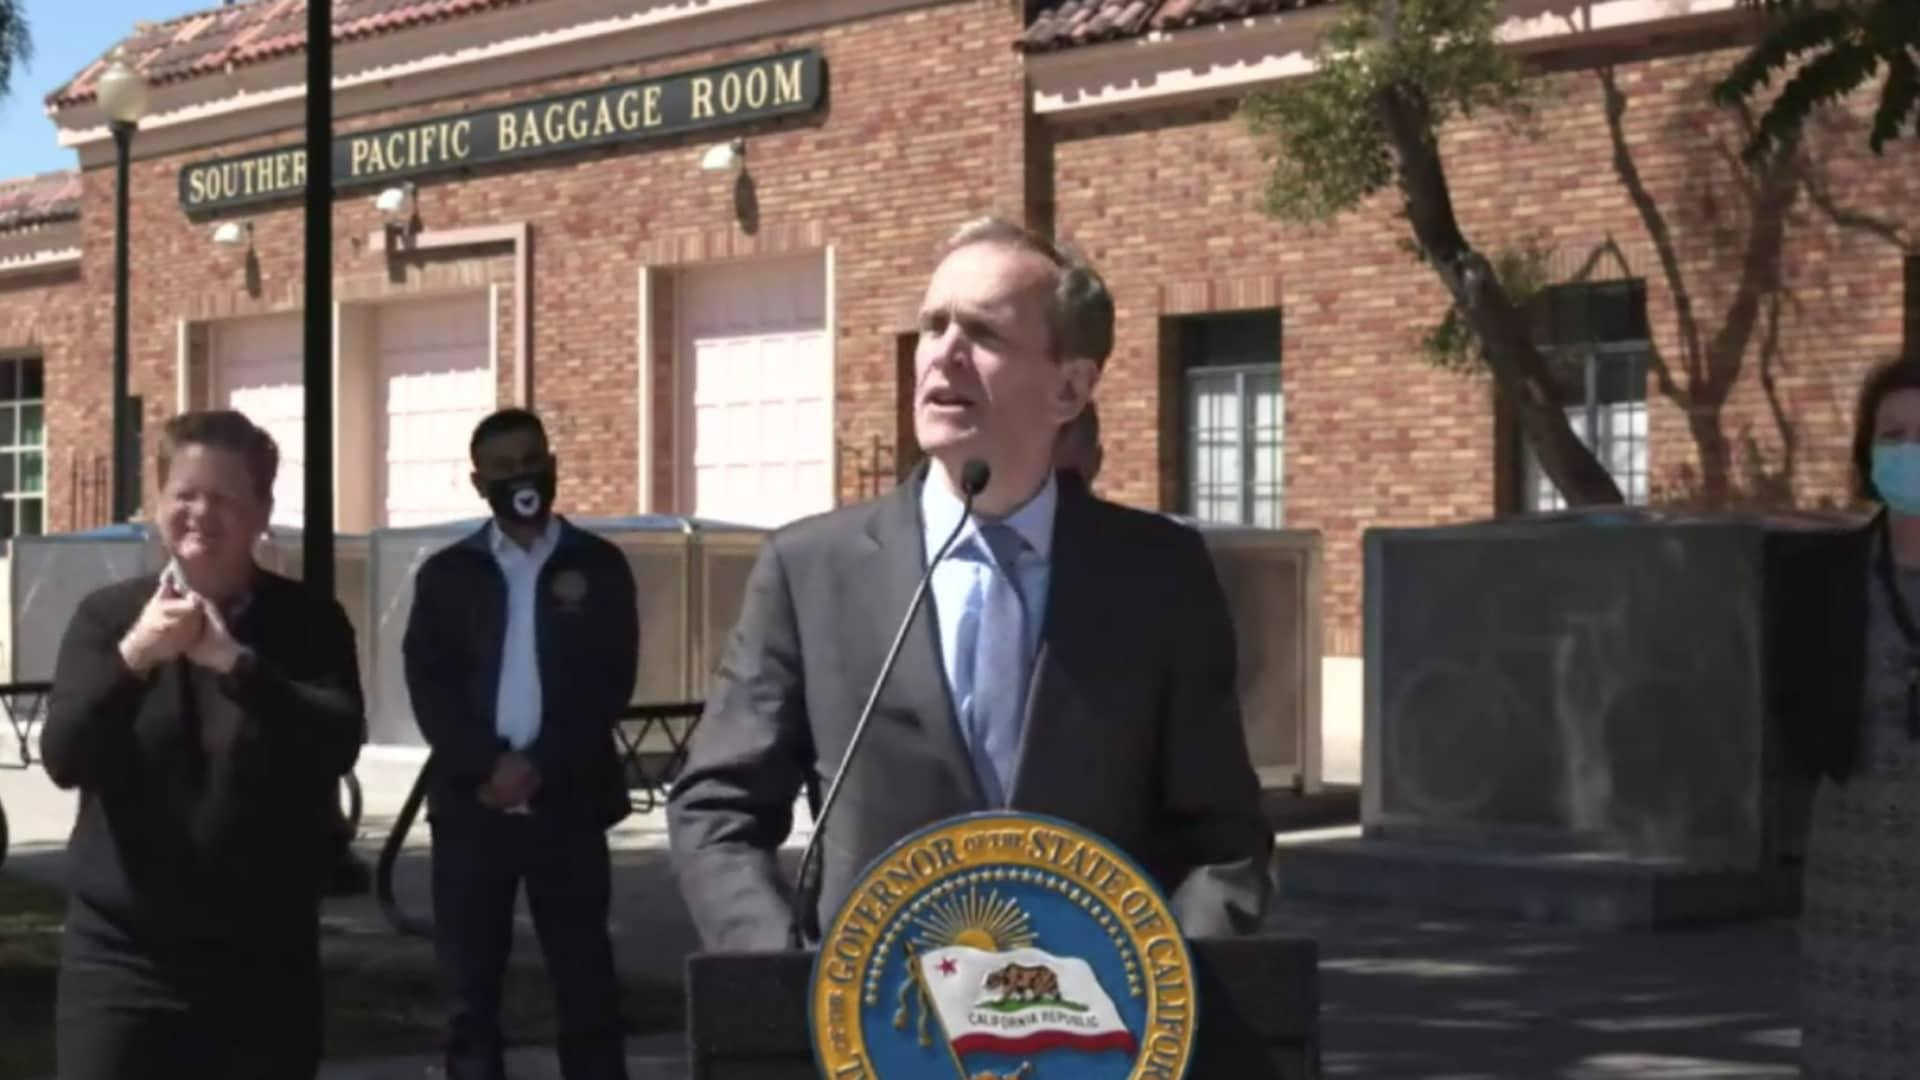 Google's chief legal officer and global affairs SVP Kent Walker spoke at a SB7 bill signing in San Jose, California, alongside Governor Gavin Newsom.